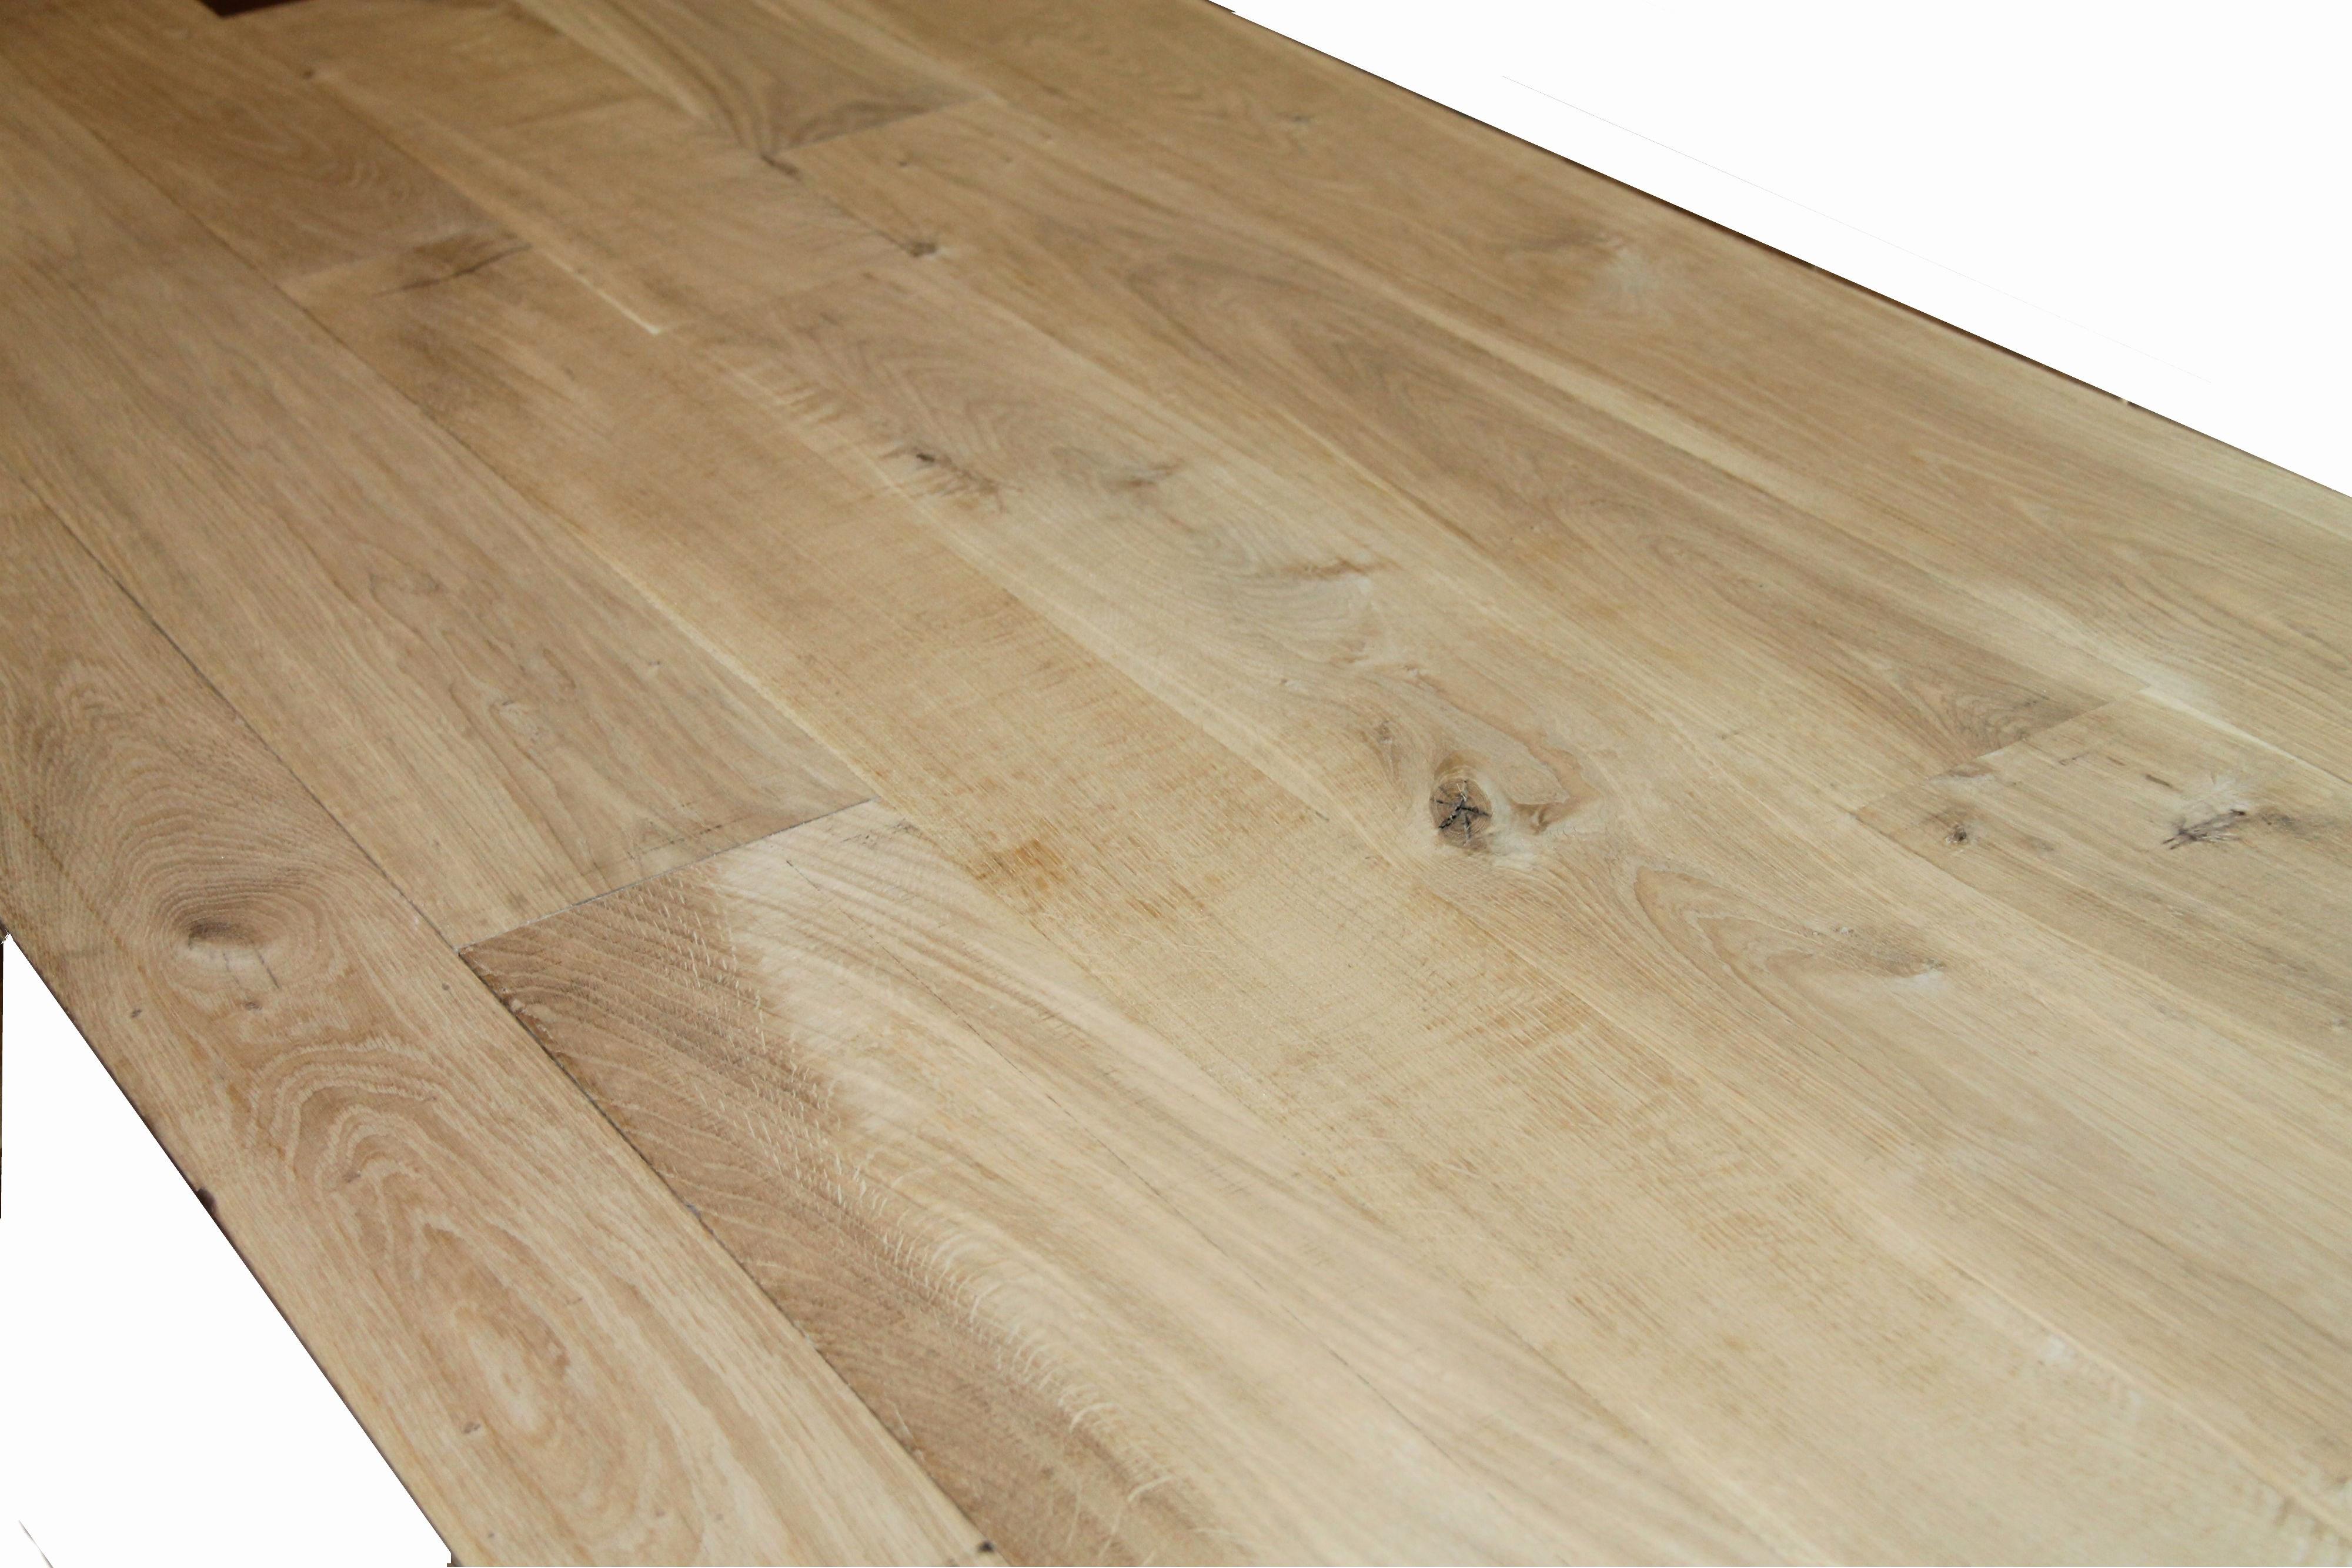 price to install engineered hardwood flooring of 18 elegant hardwood flooring cost stock dizpos com with regard to hardwood flooring cost awesome 50 fresh engineered hardwood flooring cost 50 s pics of 18 elegant